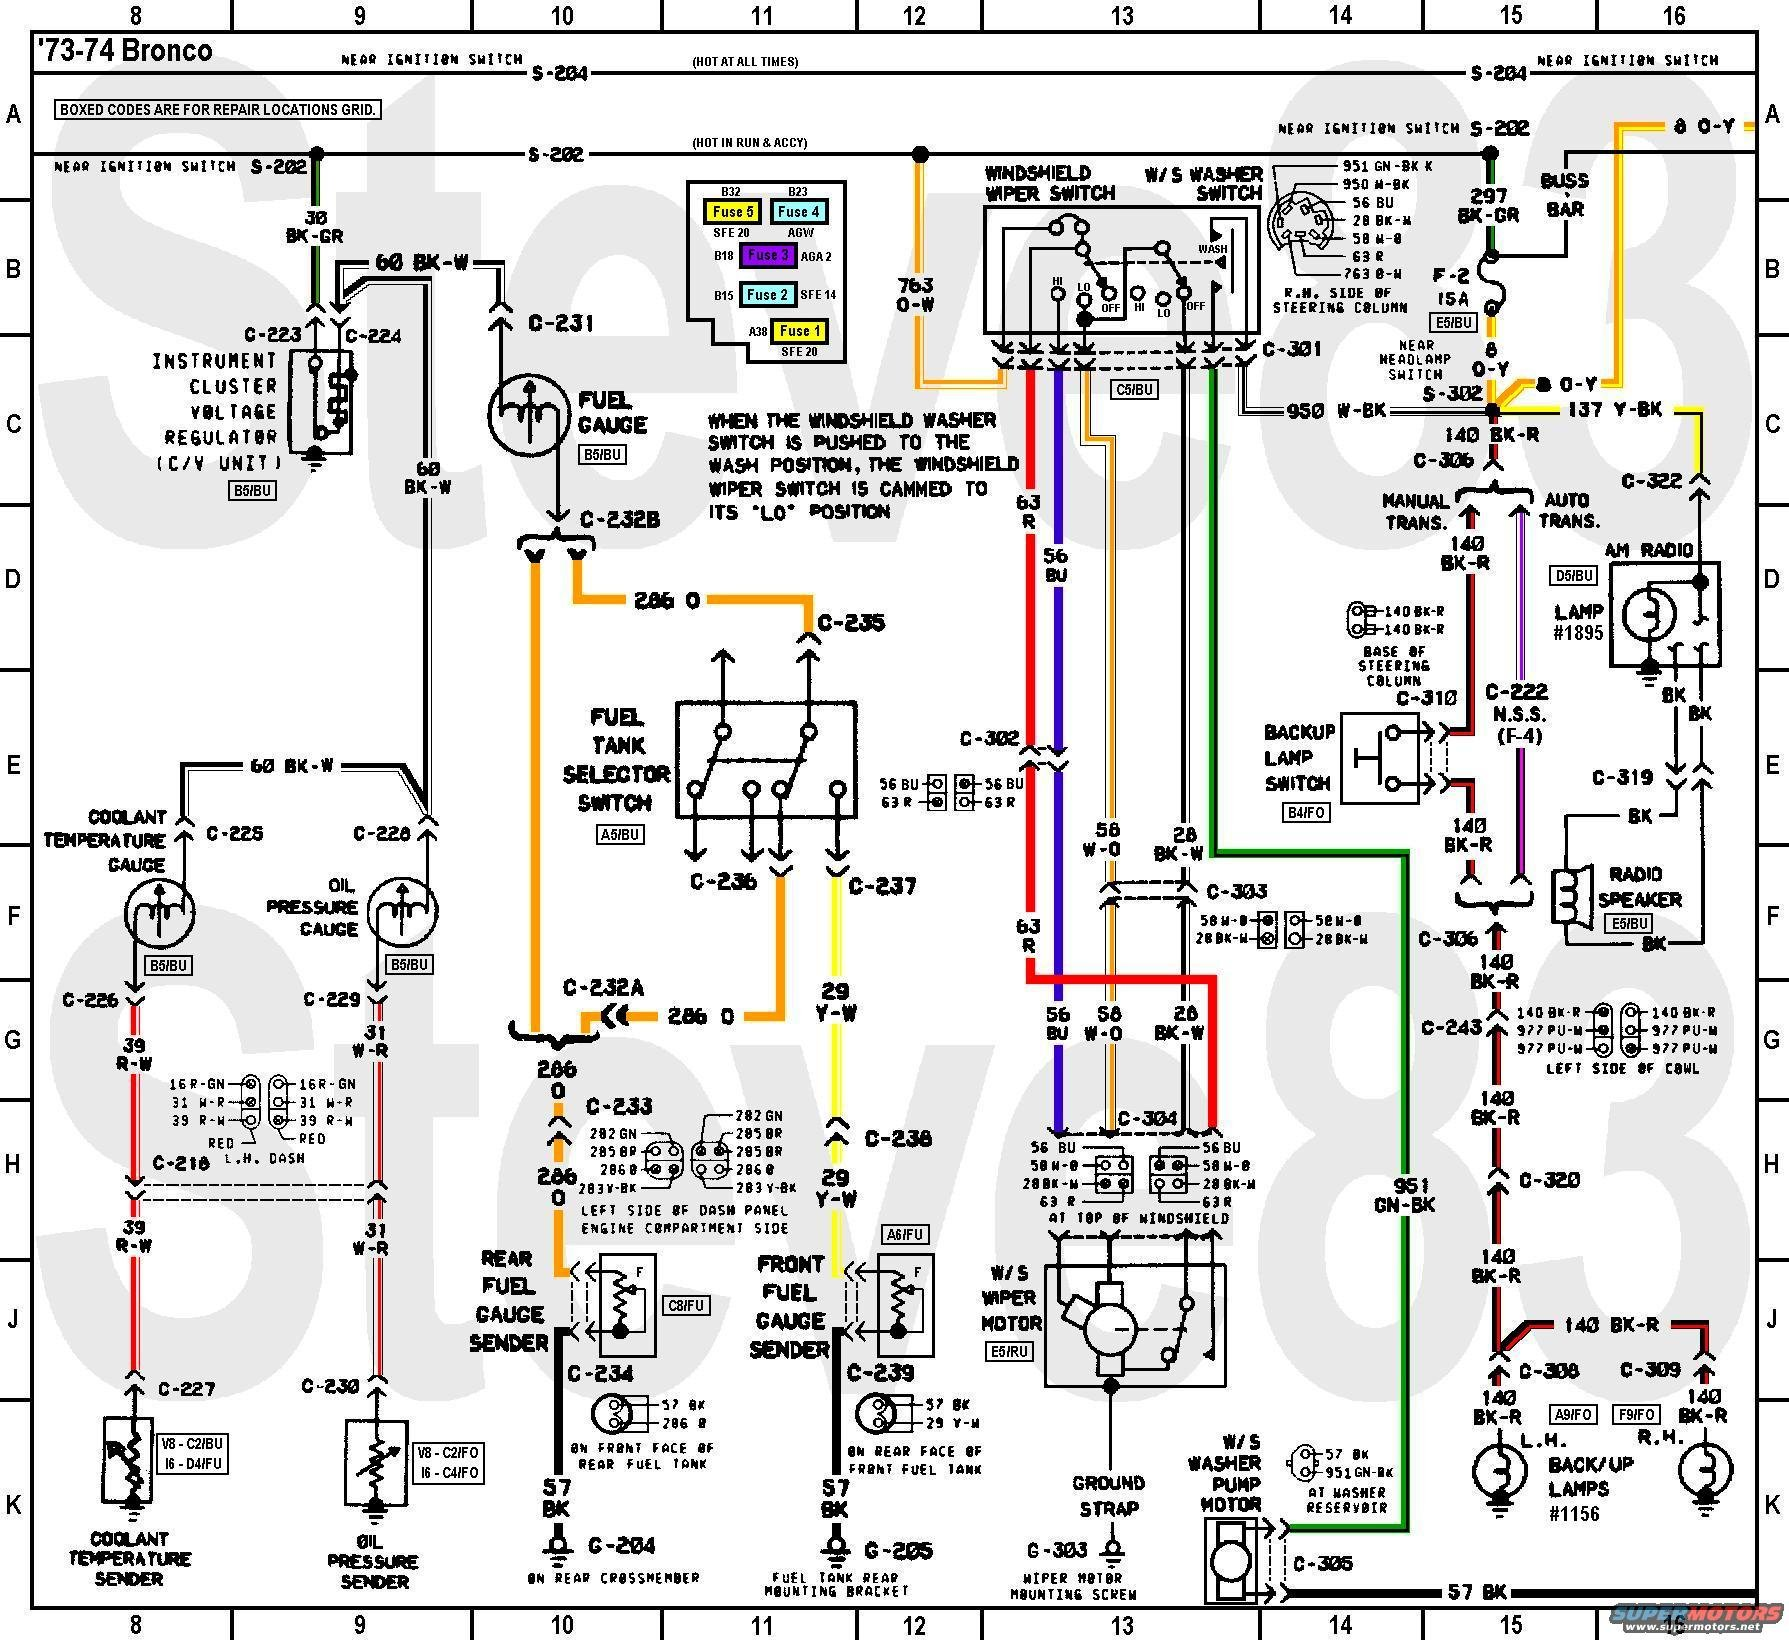 Painless Wiring Diagram 1978 Bronco on wiring diagram for 1978 bronco, wire diagram for 1970 ford bronco, control circuit ford bronco,